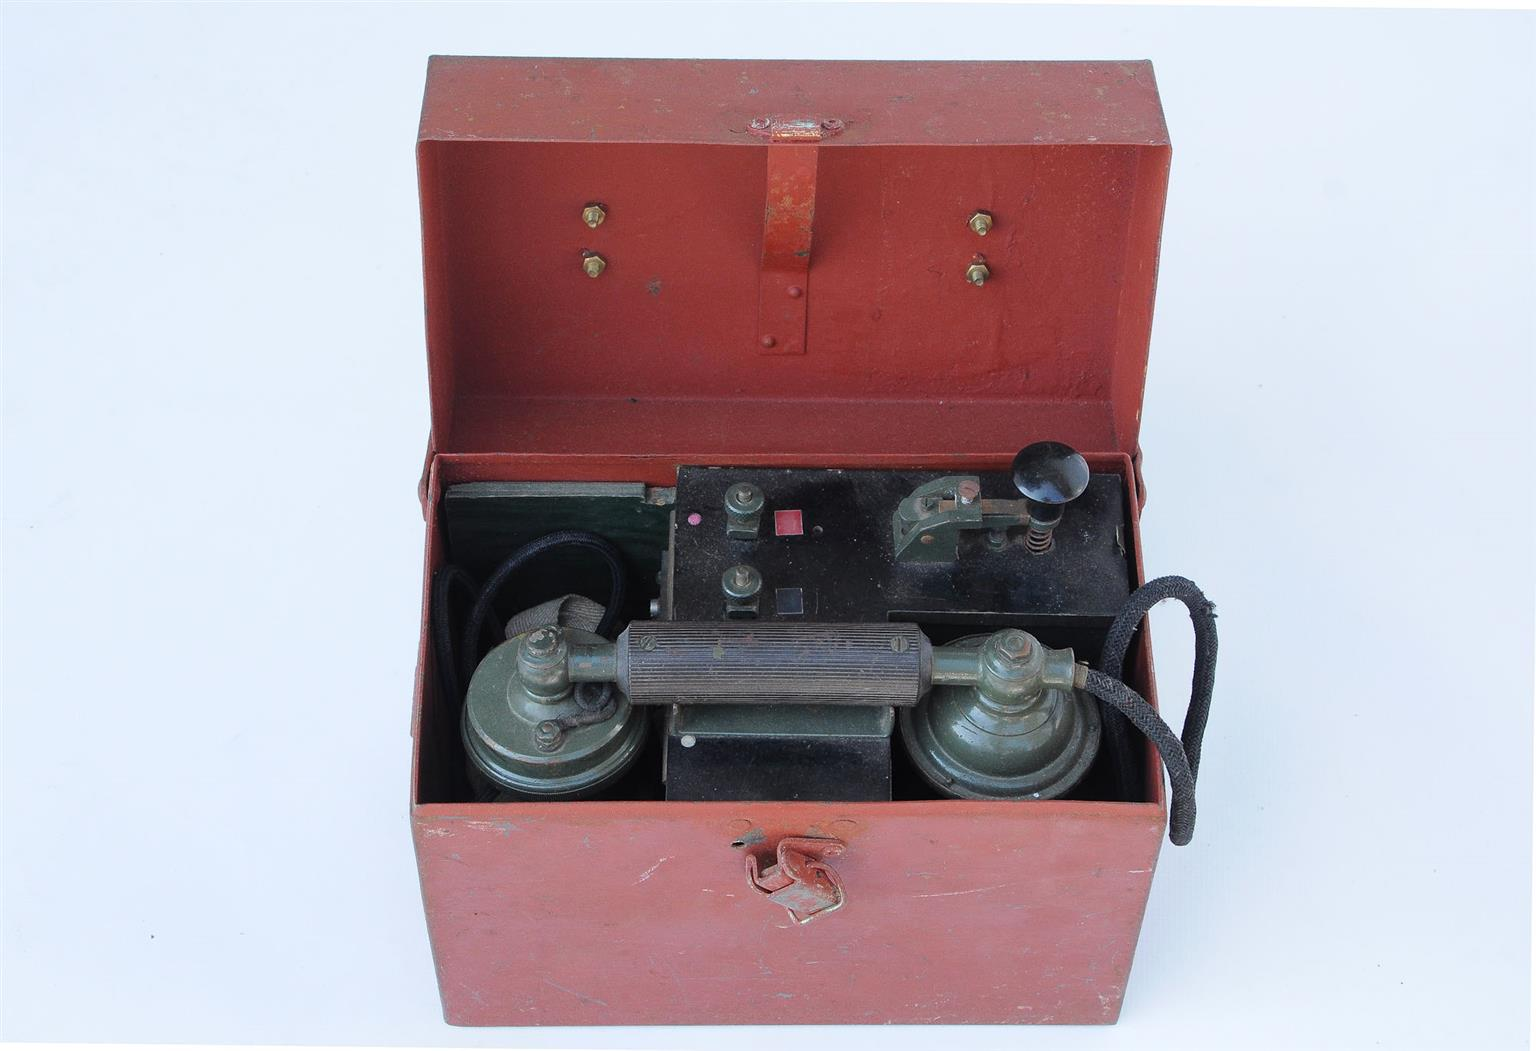 Pair of LM Ericsson ALLM.A.B Field Telephones - SKU 1590